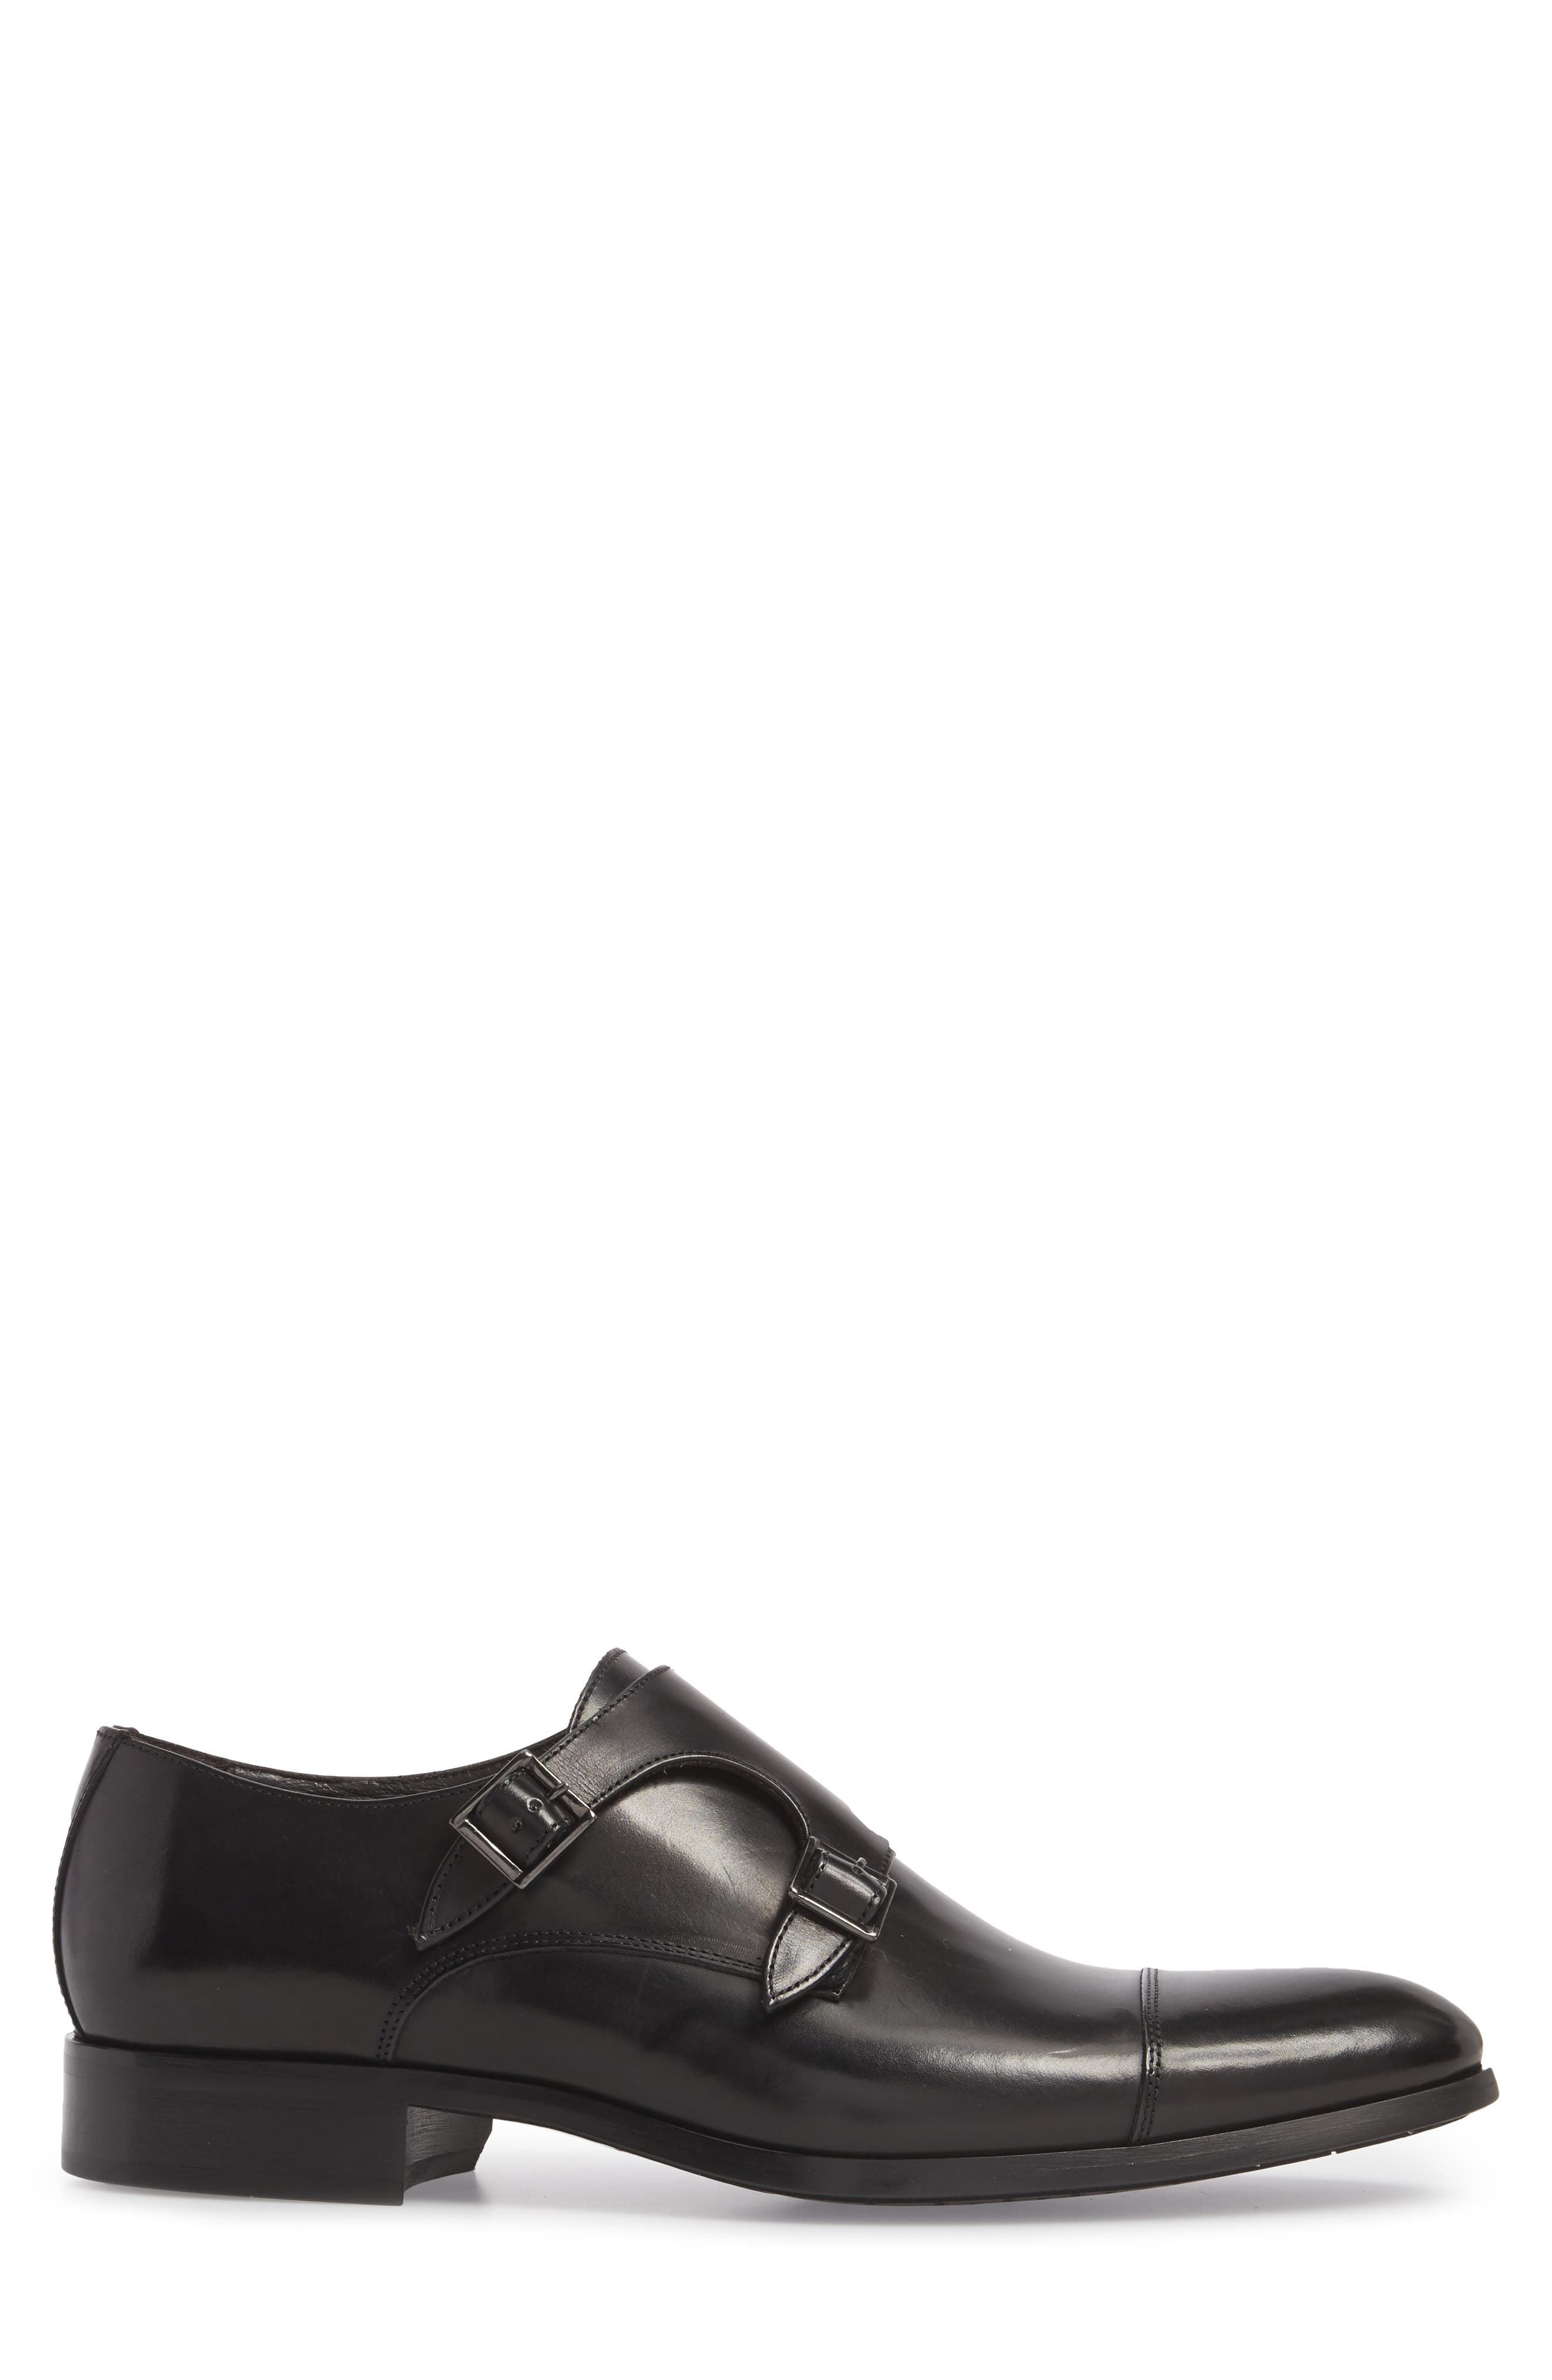 Bankston Cap Toe Double Strap Monk Shoe,                             Alternate thumbnail 3, color,                             BLACK LEATHER